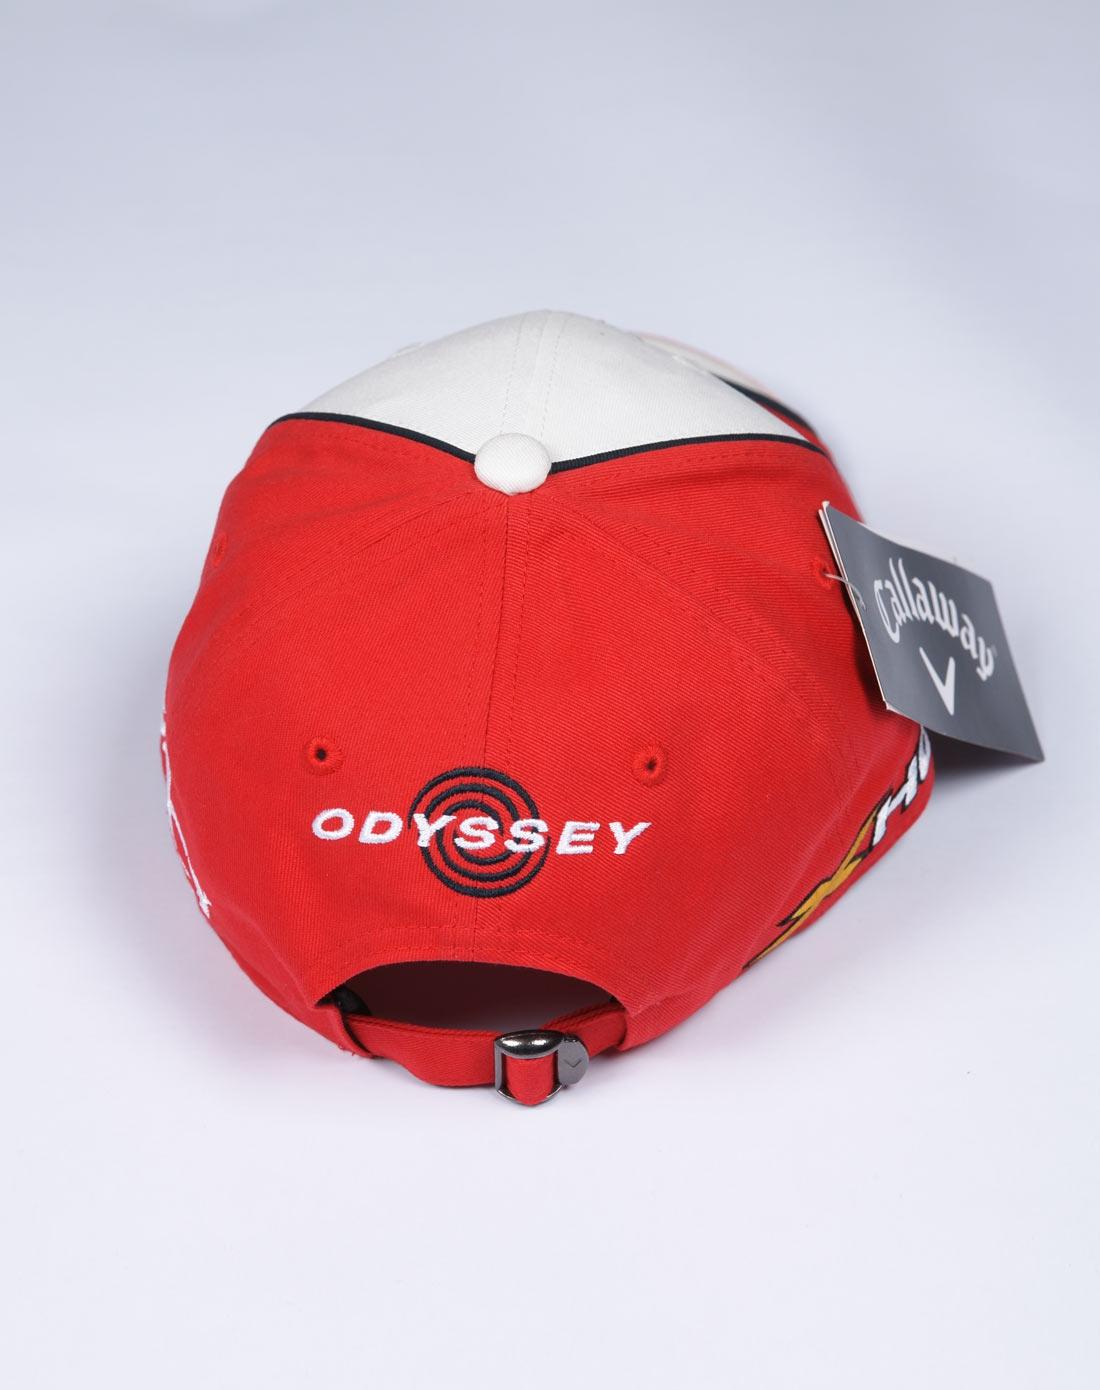 callaway男女男士红色帽子242mlg984608100